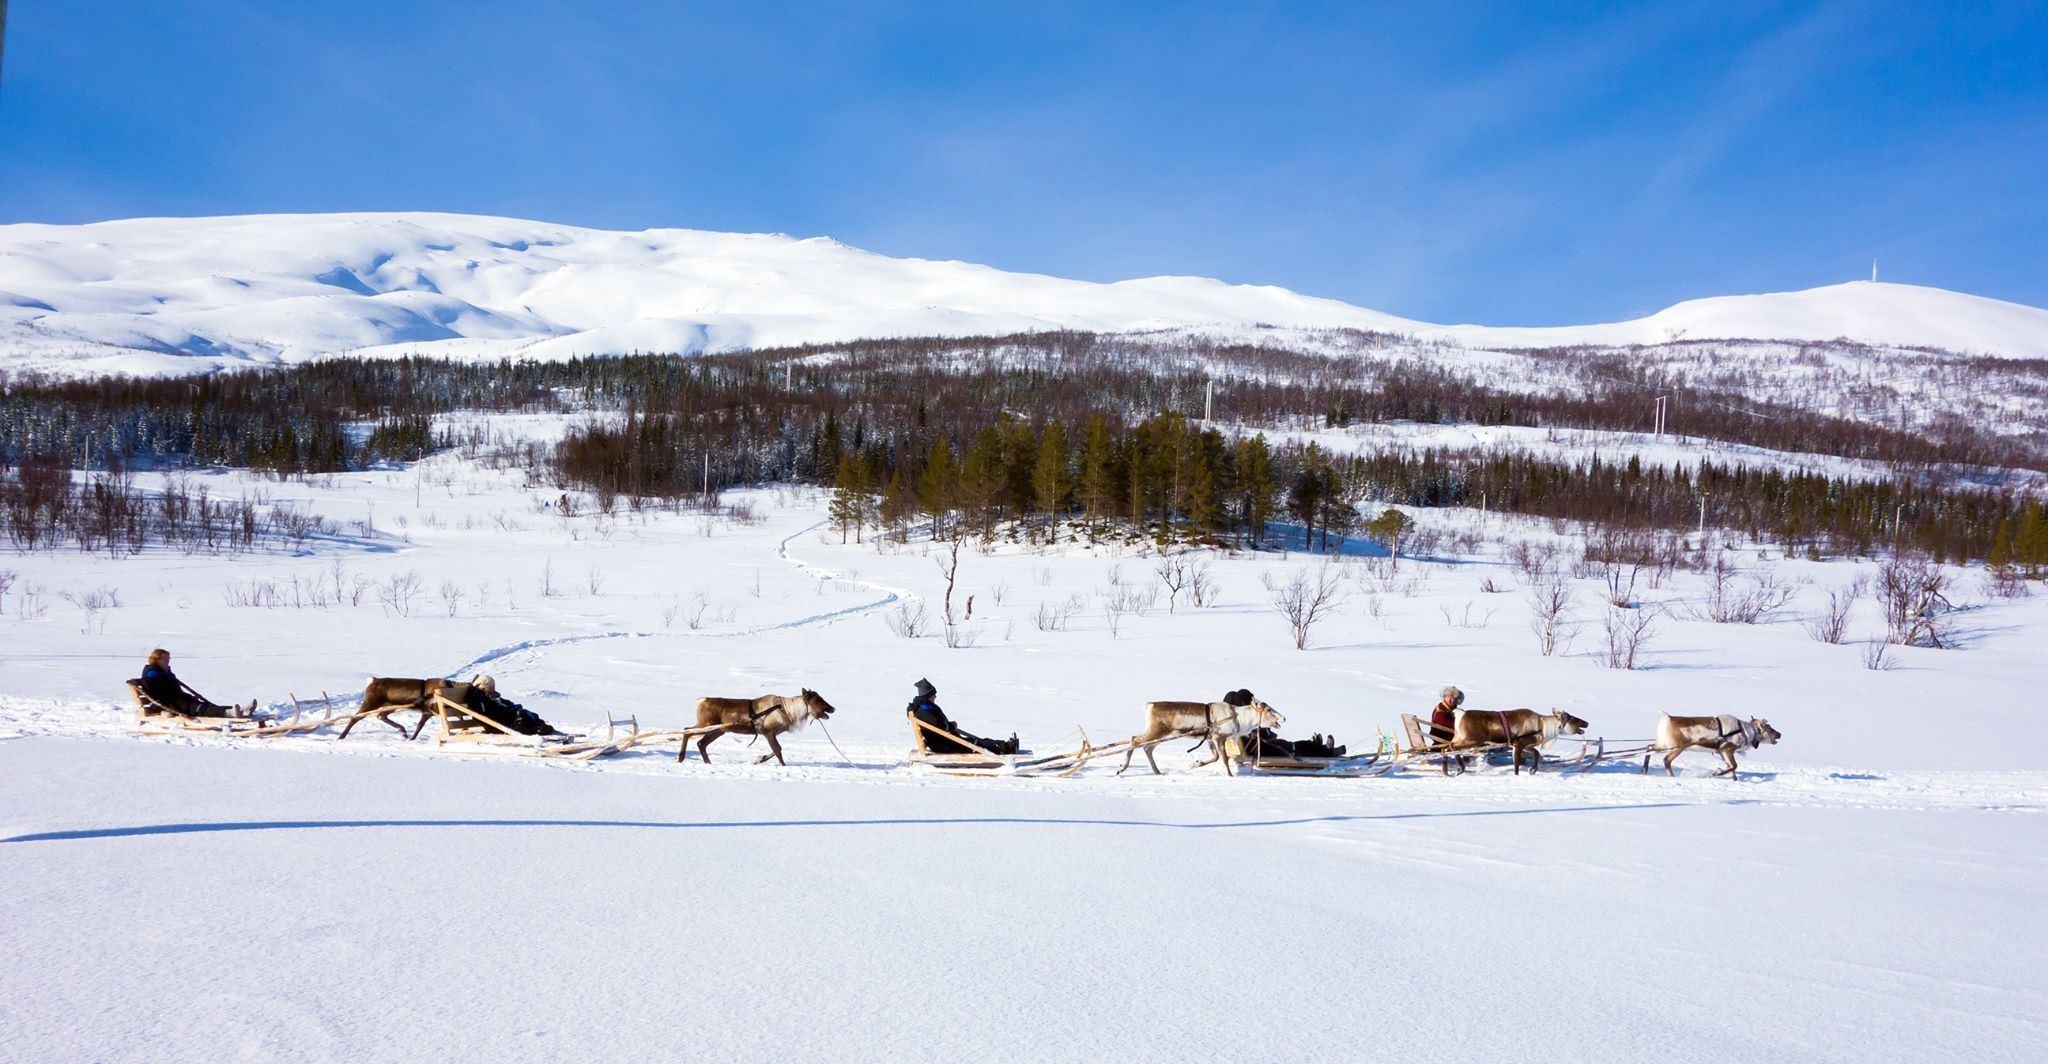 Reindeer Sledding with Sami Culture - Tromsø Lapland